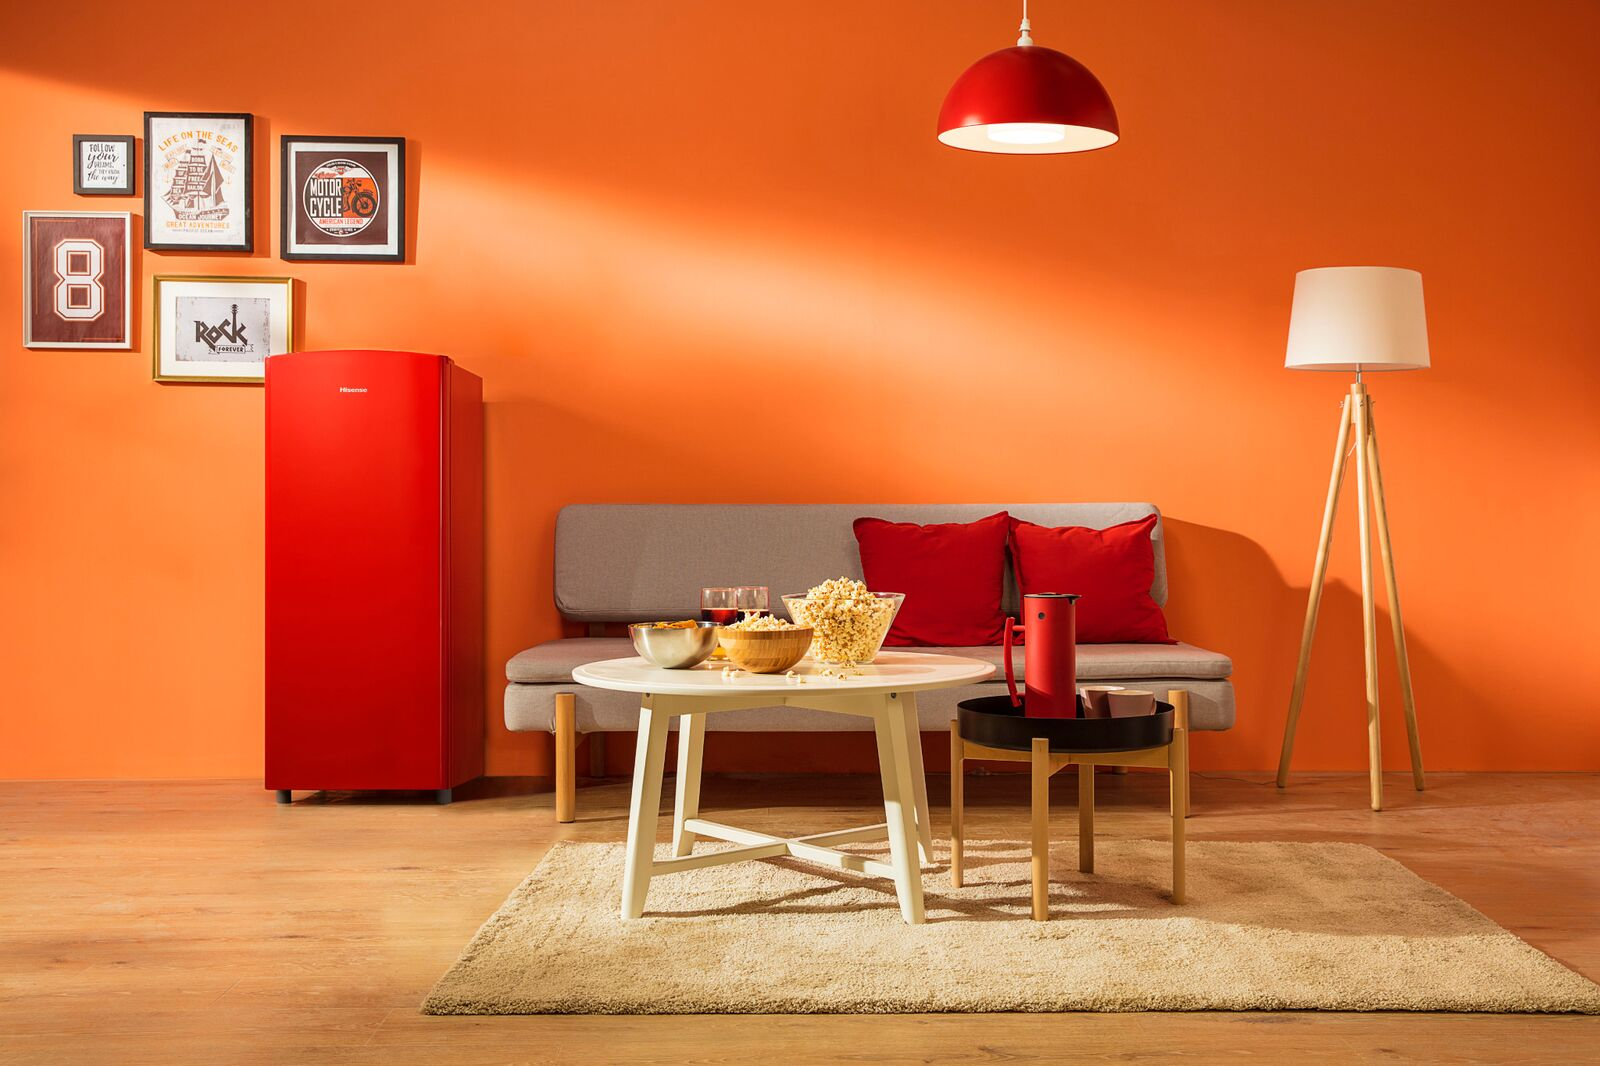 Hisense porta lo stile in cucina con i suoi frigoriferi Pop thumbnail